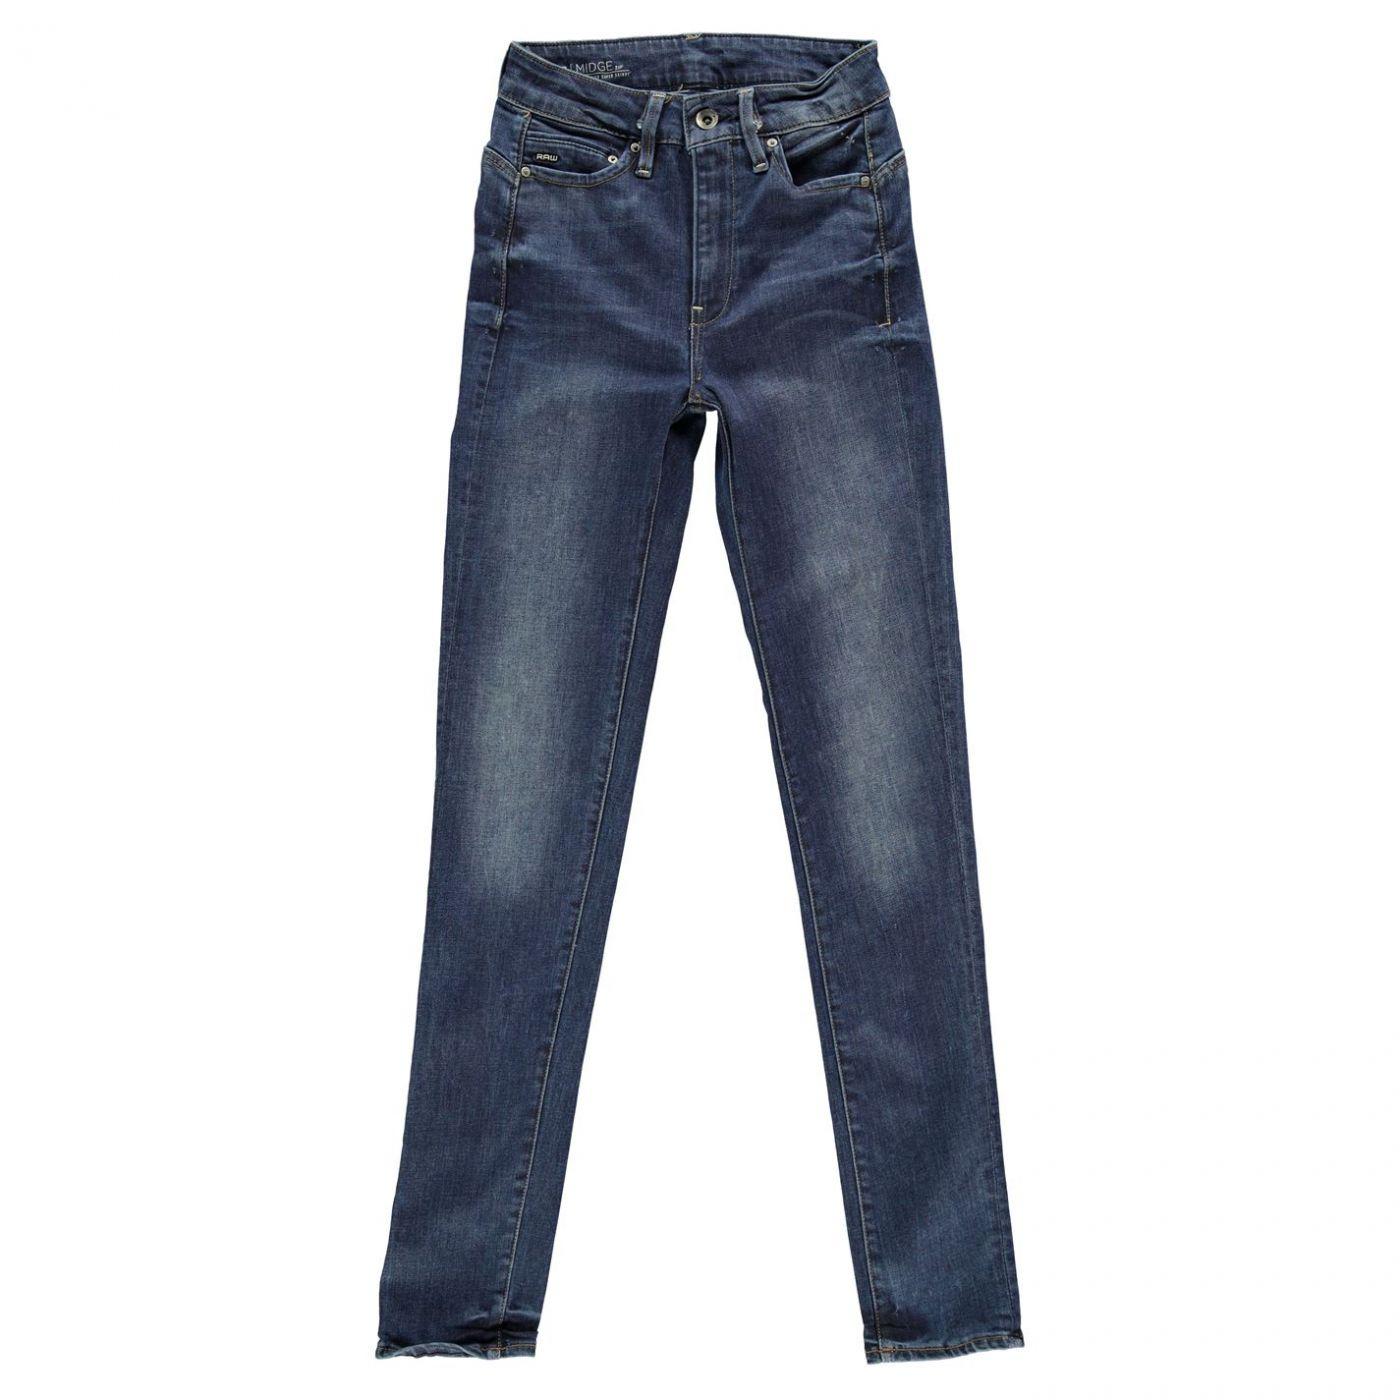 G Star 60900 Jeans